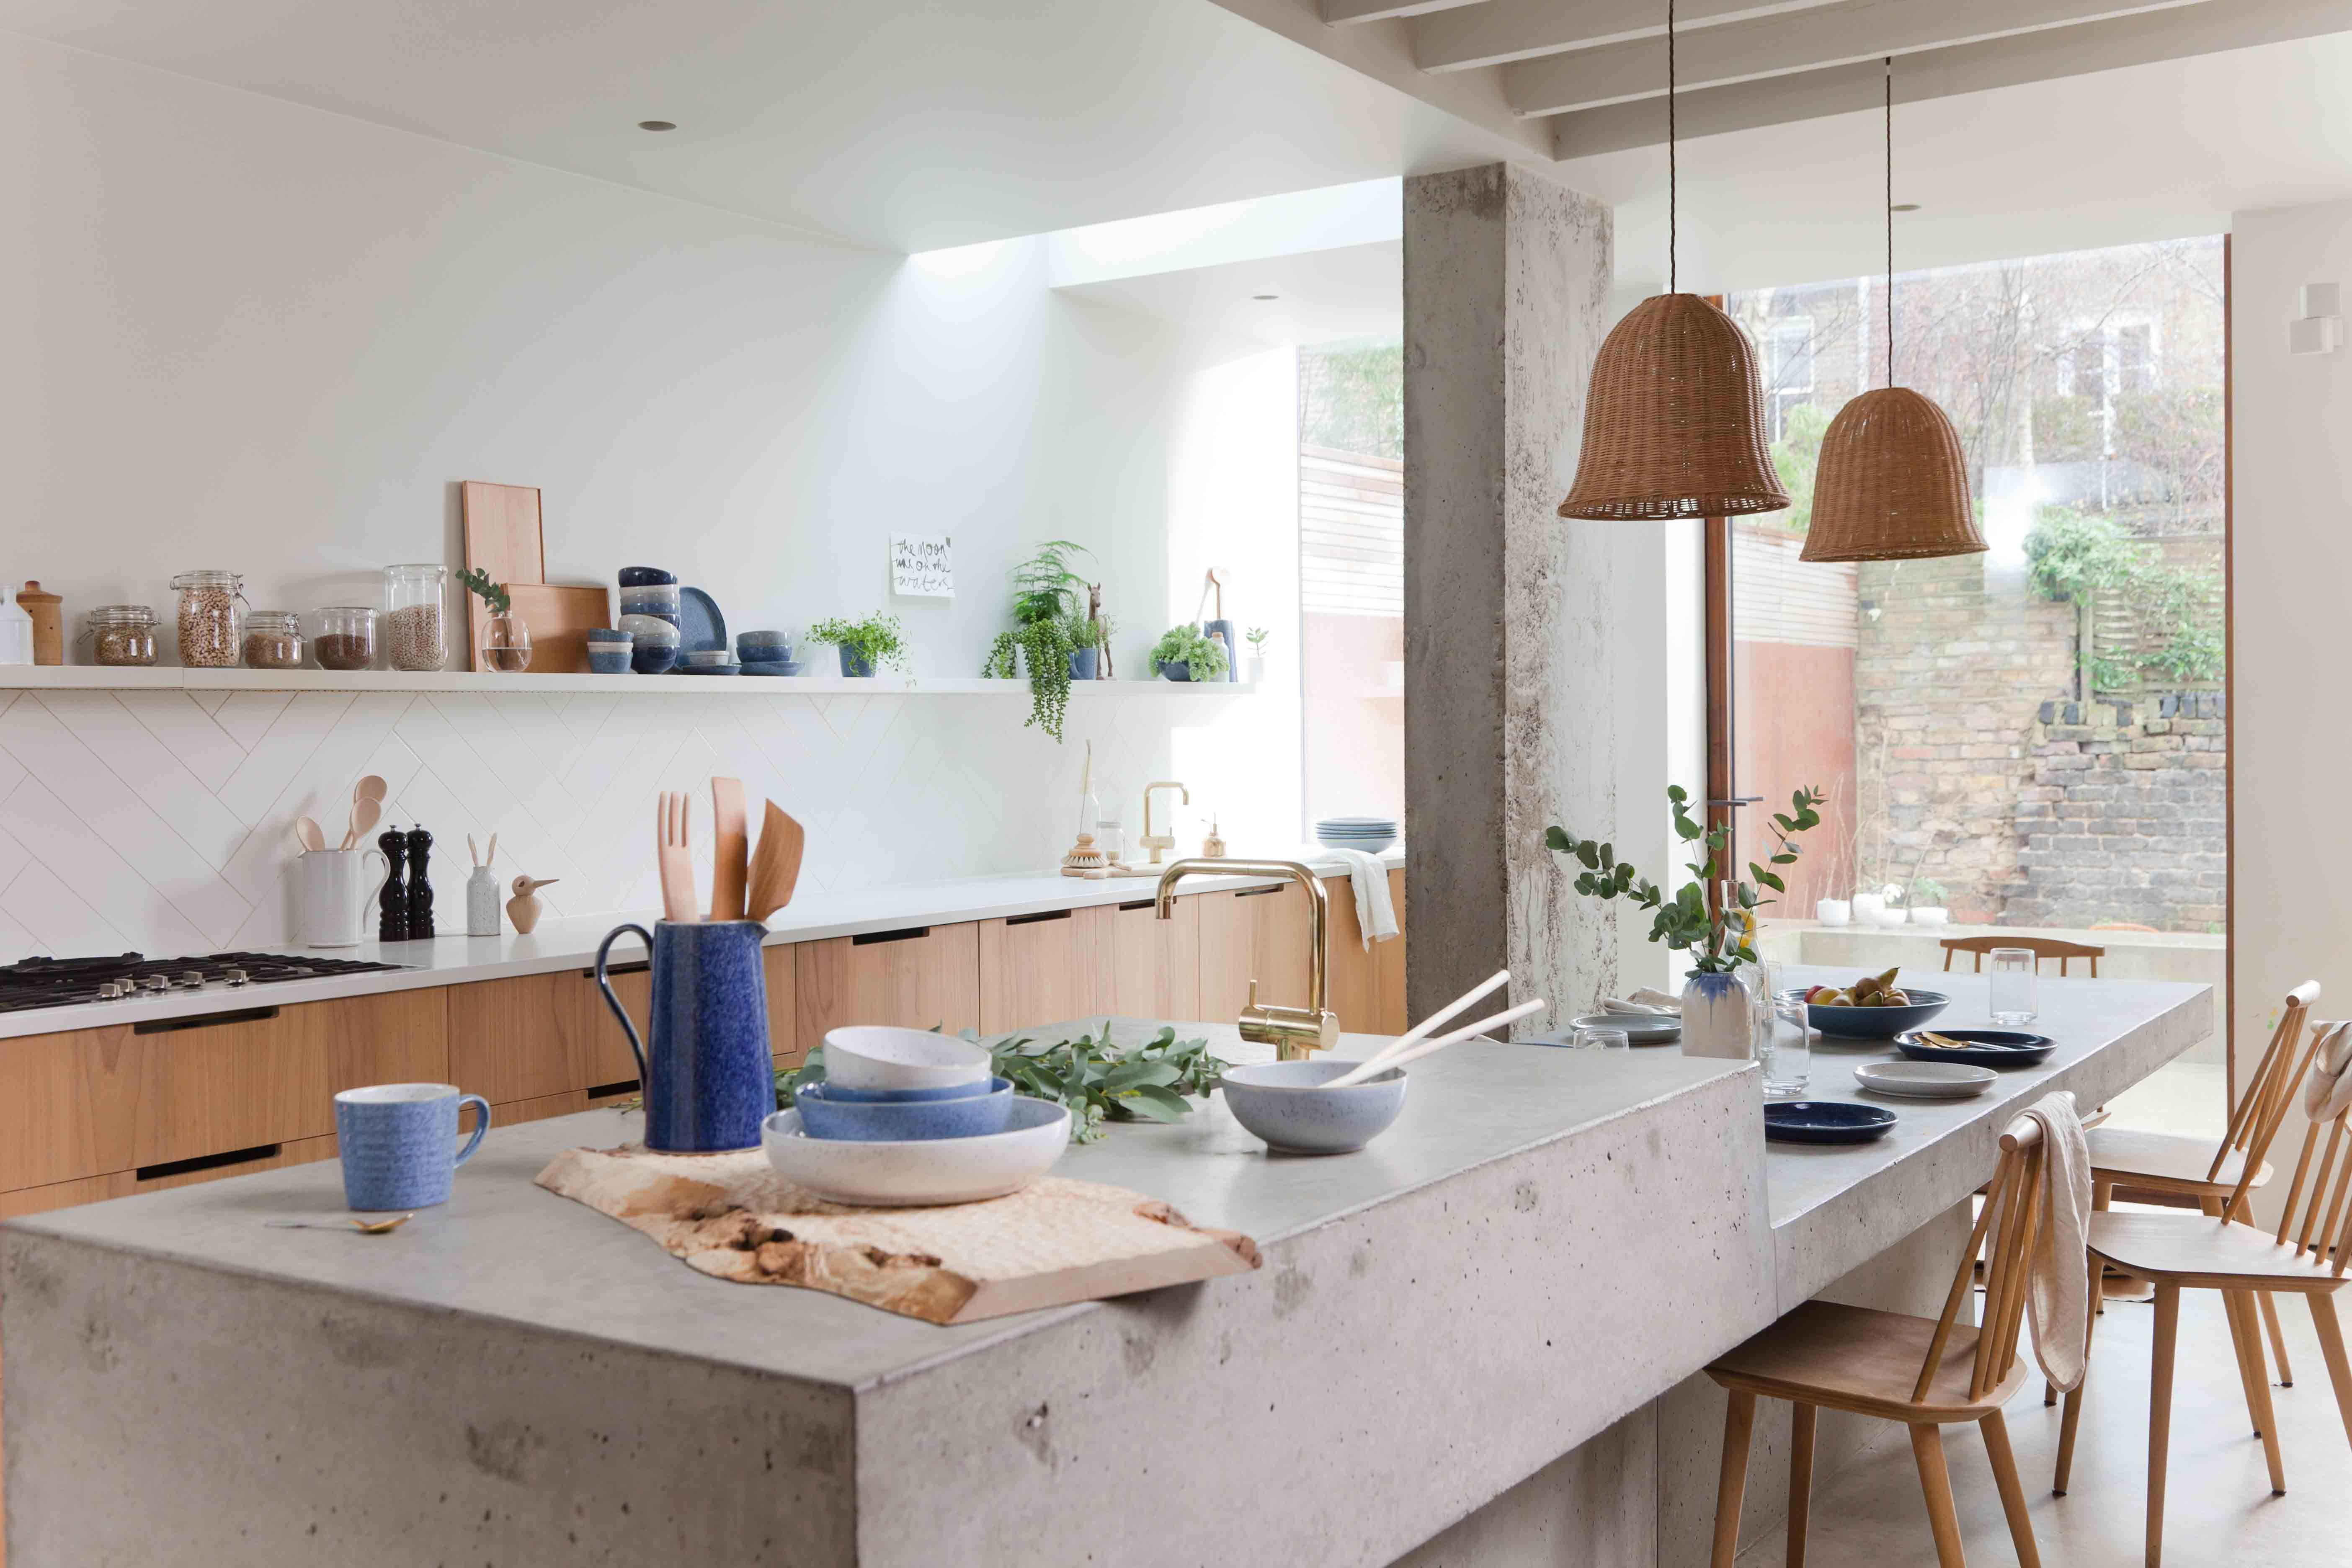 How To Create A Mindful Kitchen - Modern Kitchen Ideas